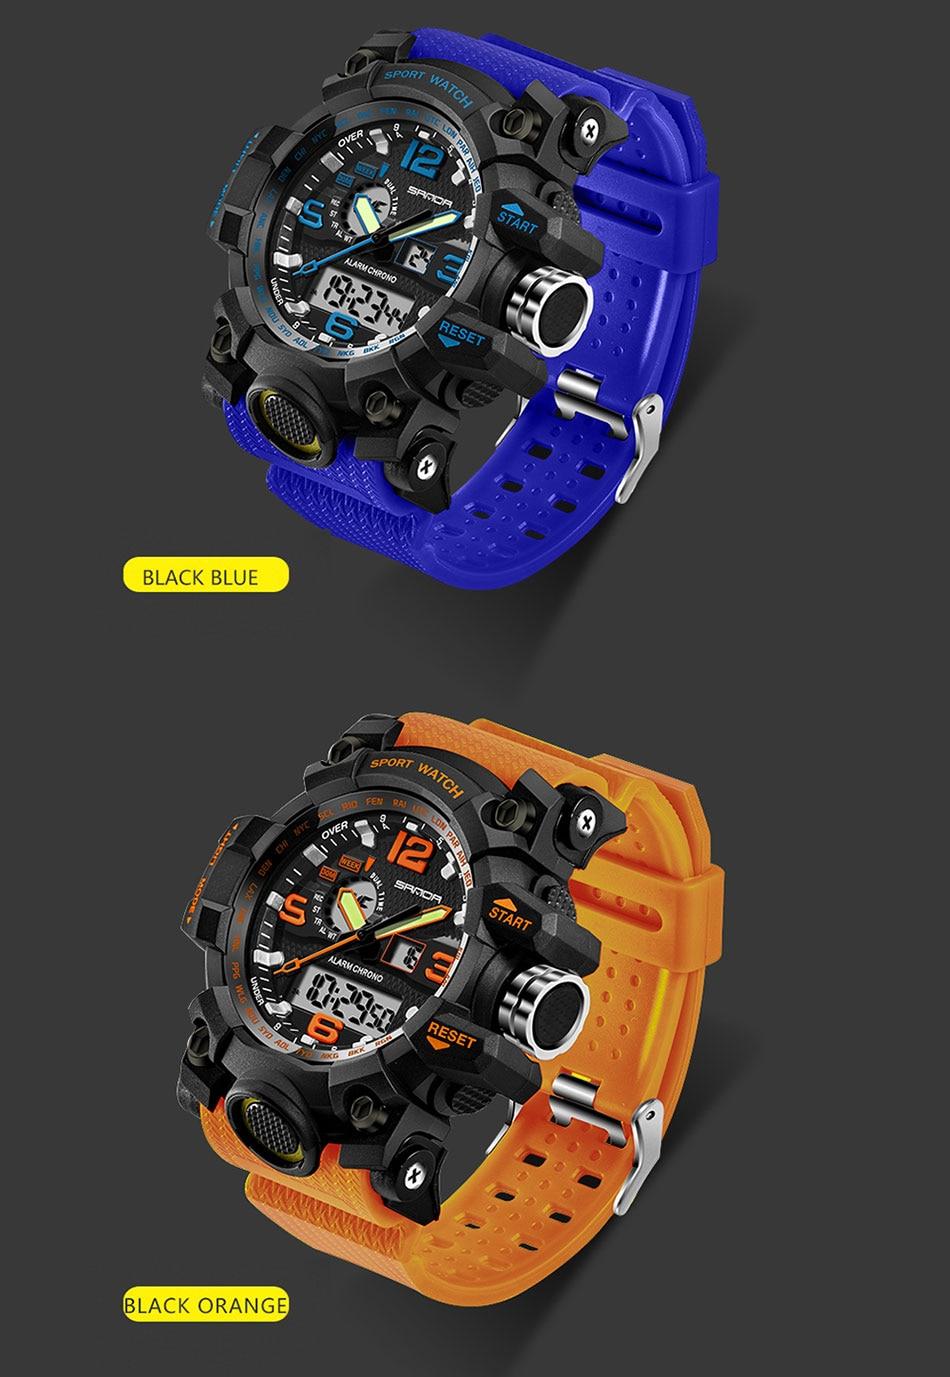 HTB14MJuSpXXXXbvXFXXq6xXFXXXX - SANDA Waterproof Sport Watc for Men